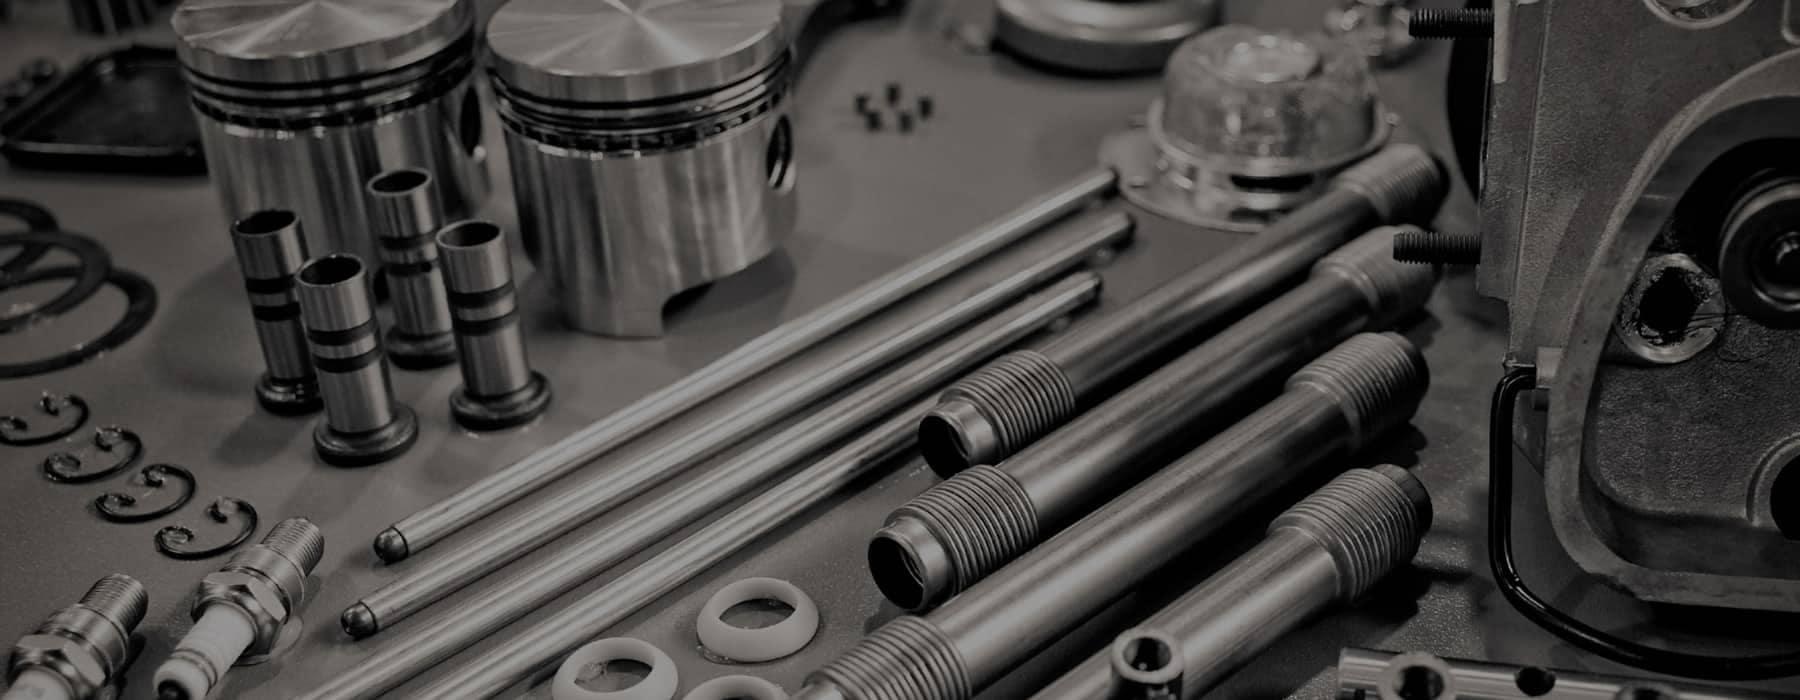 Parts-Banner-1800x700